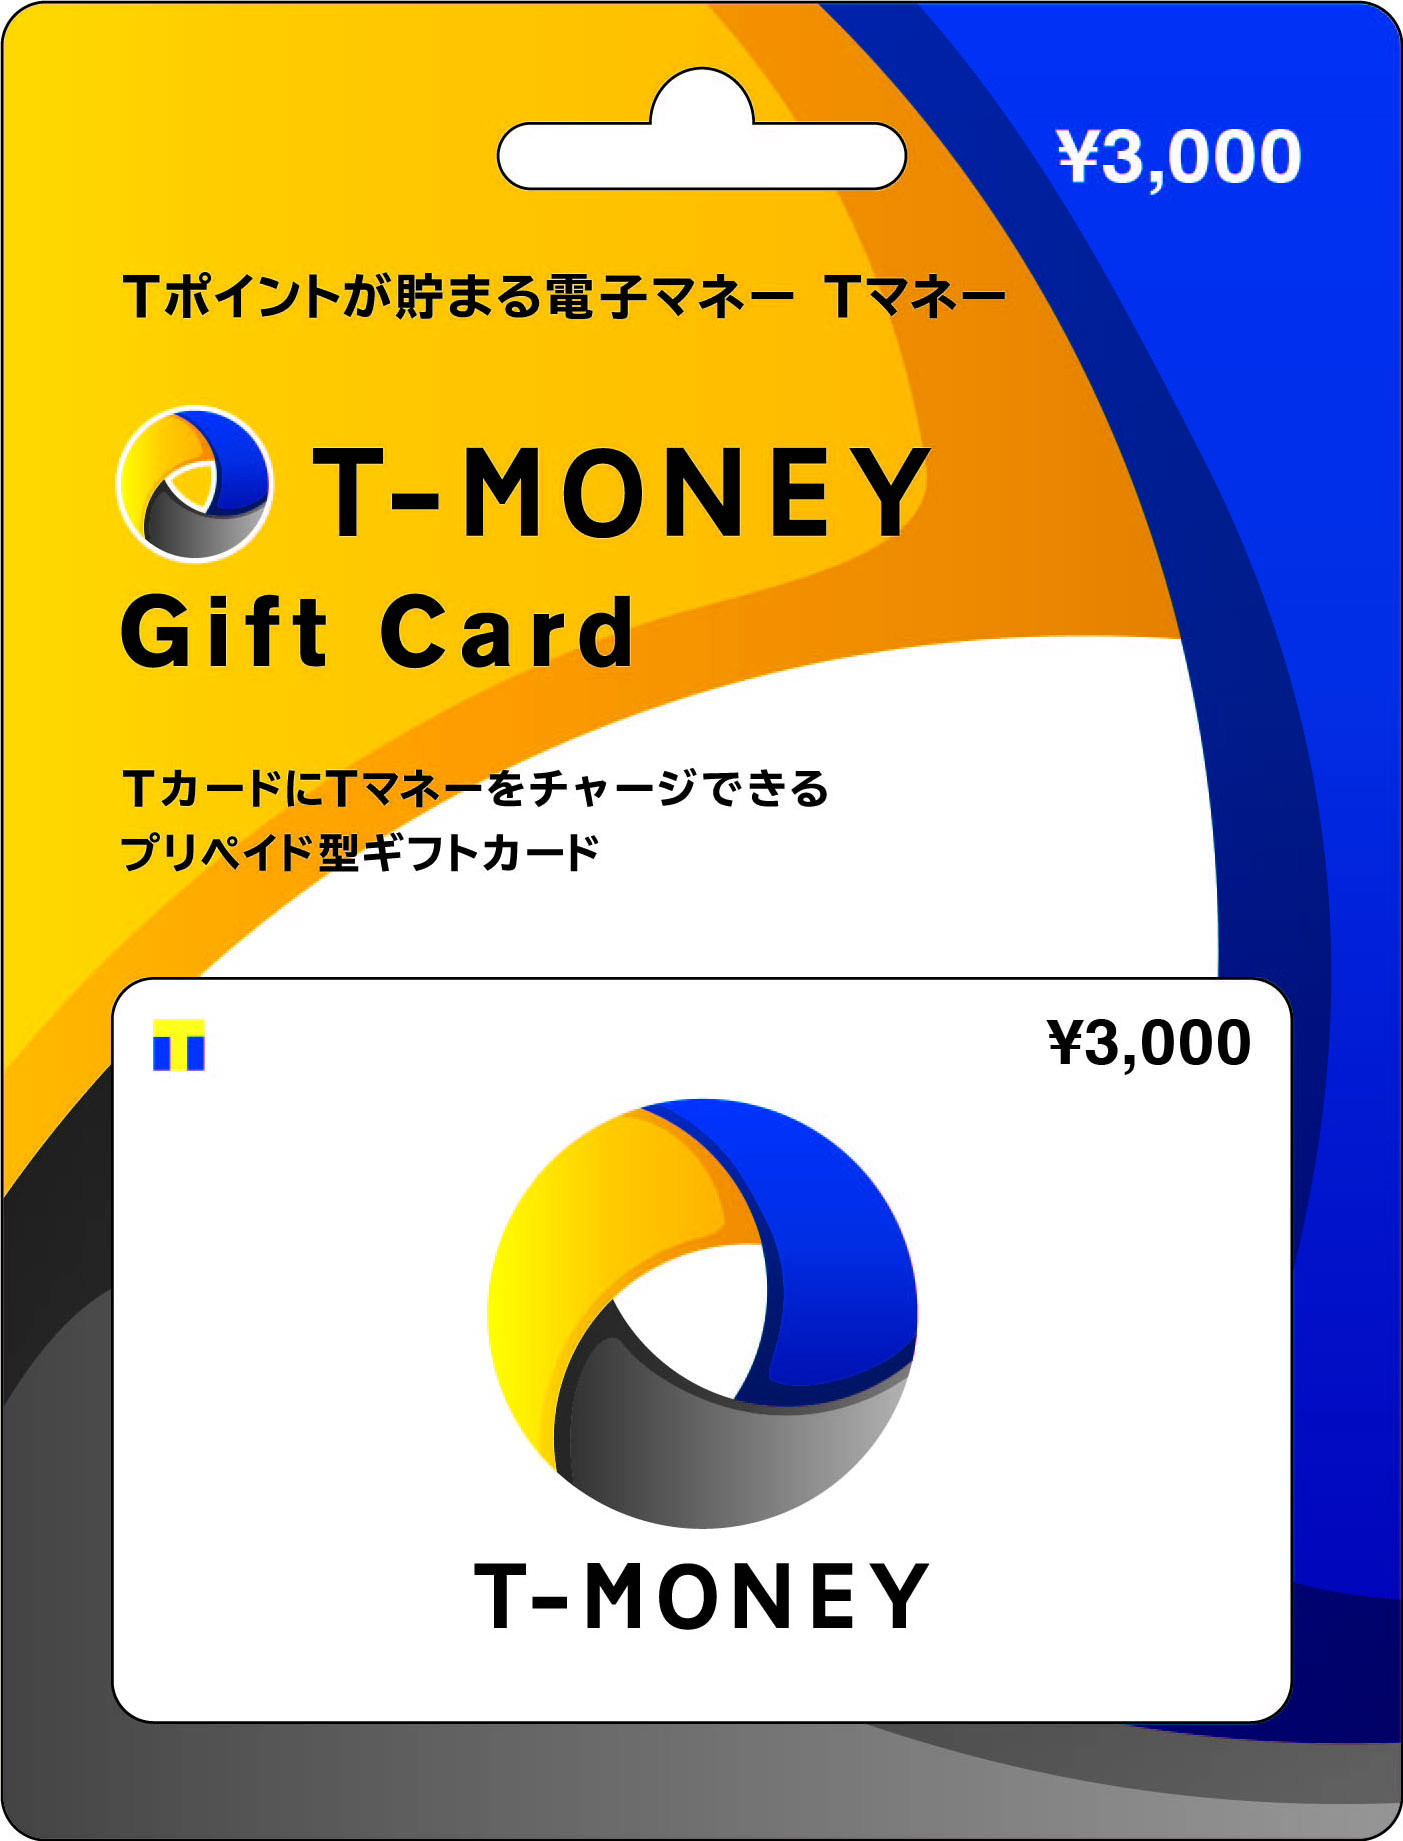 http://www.ccc.co.jp/news/img/card_on_3000.jpg